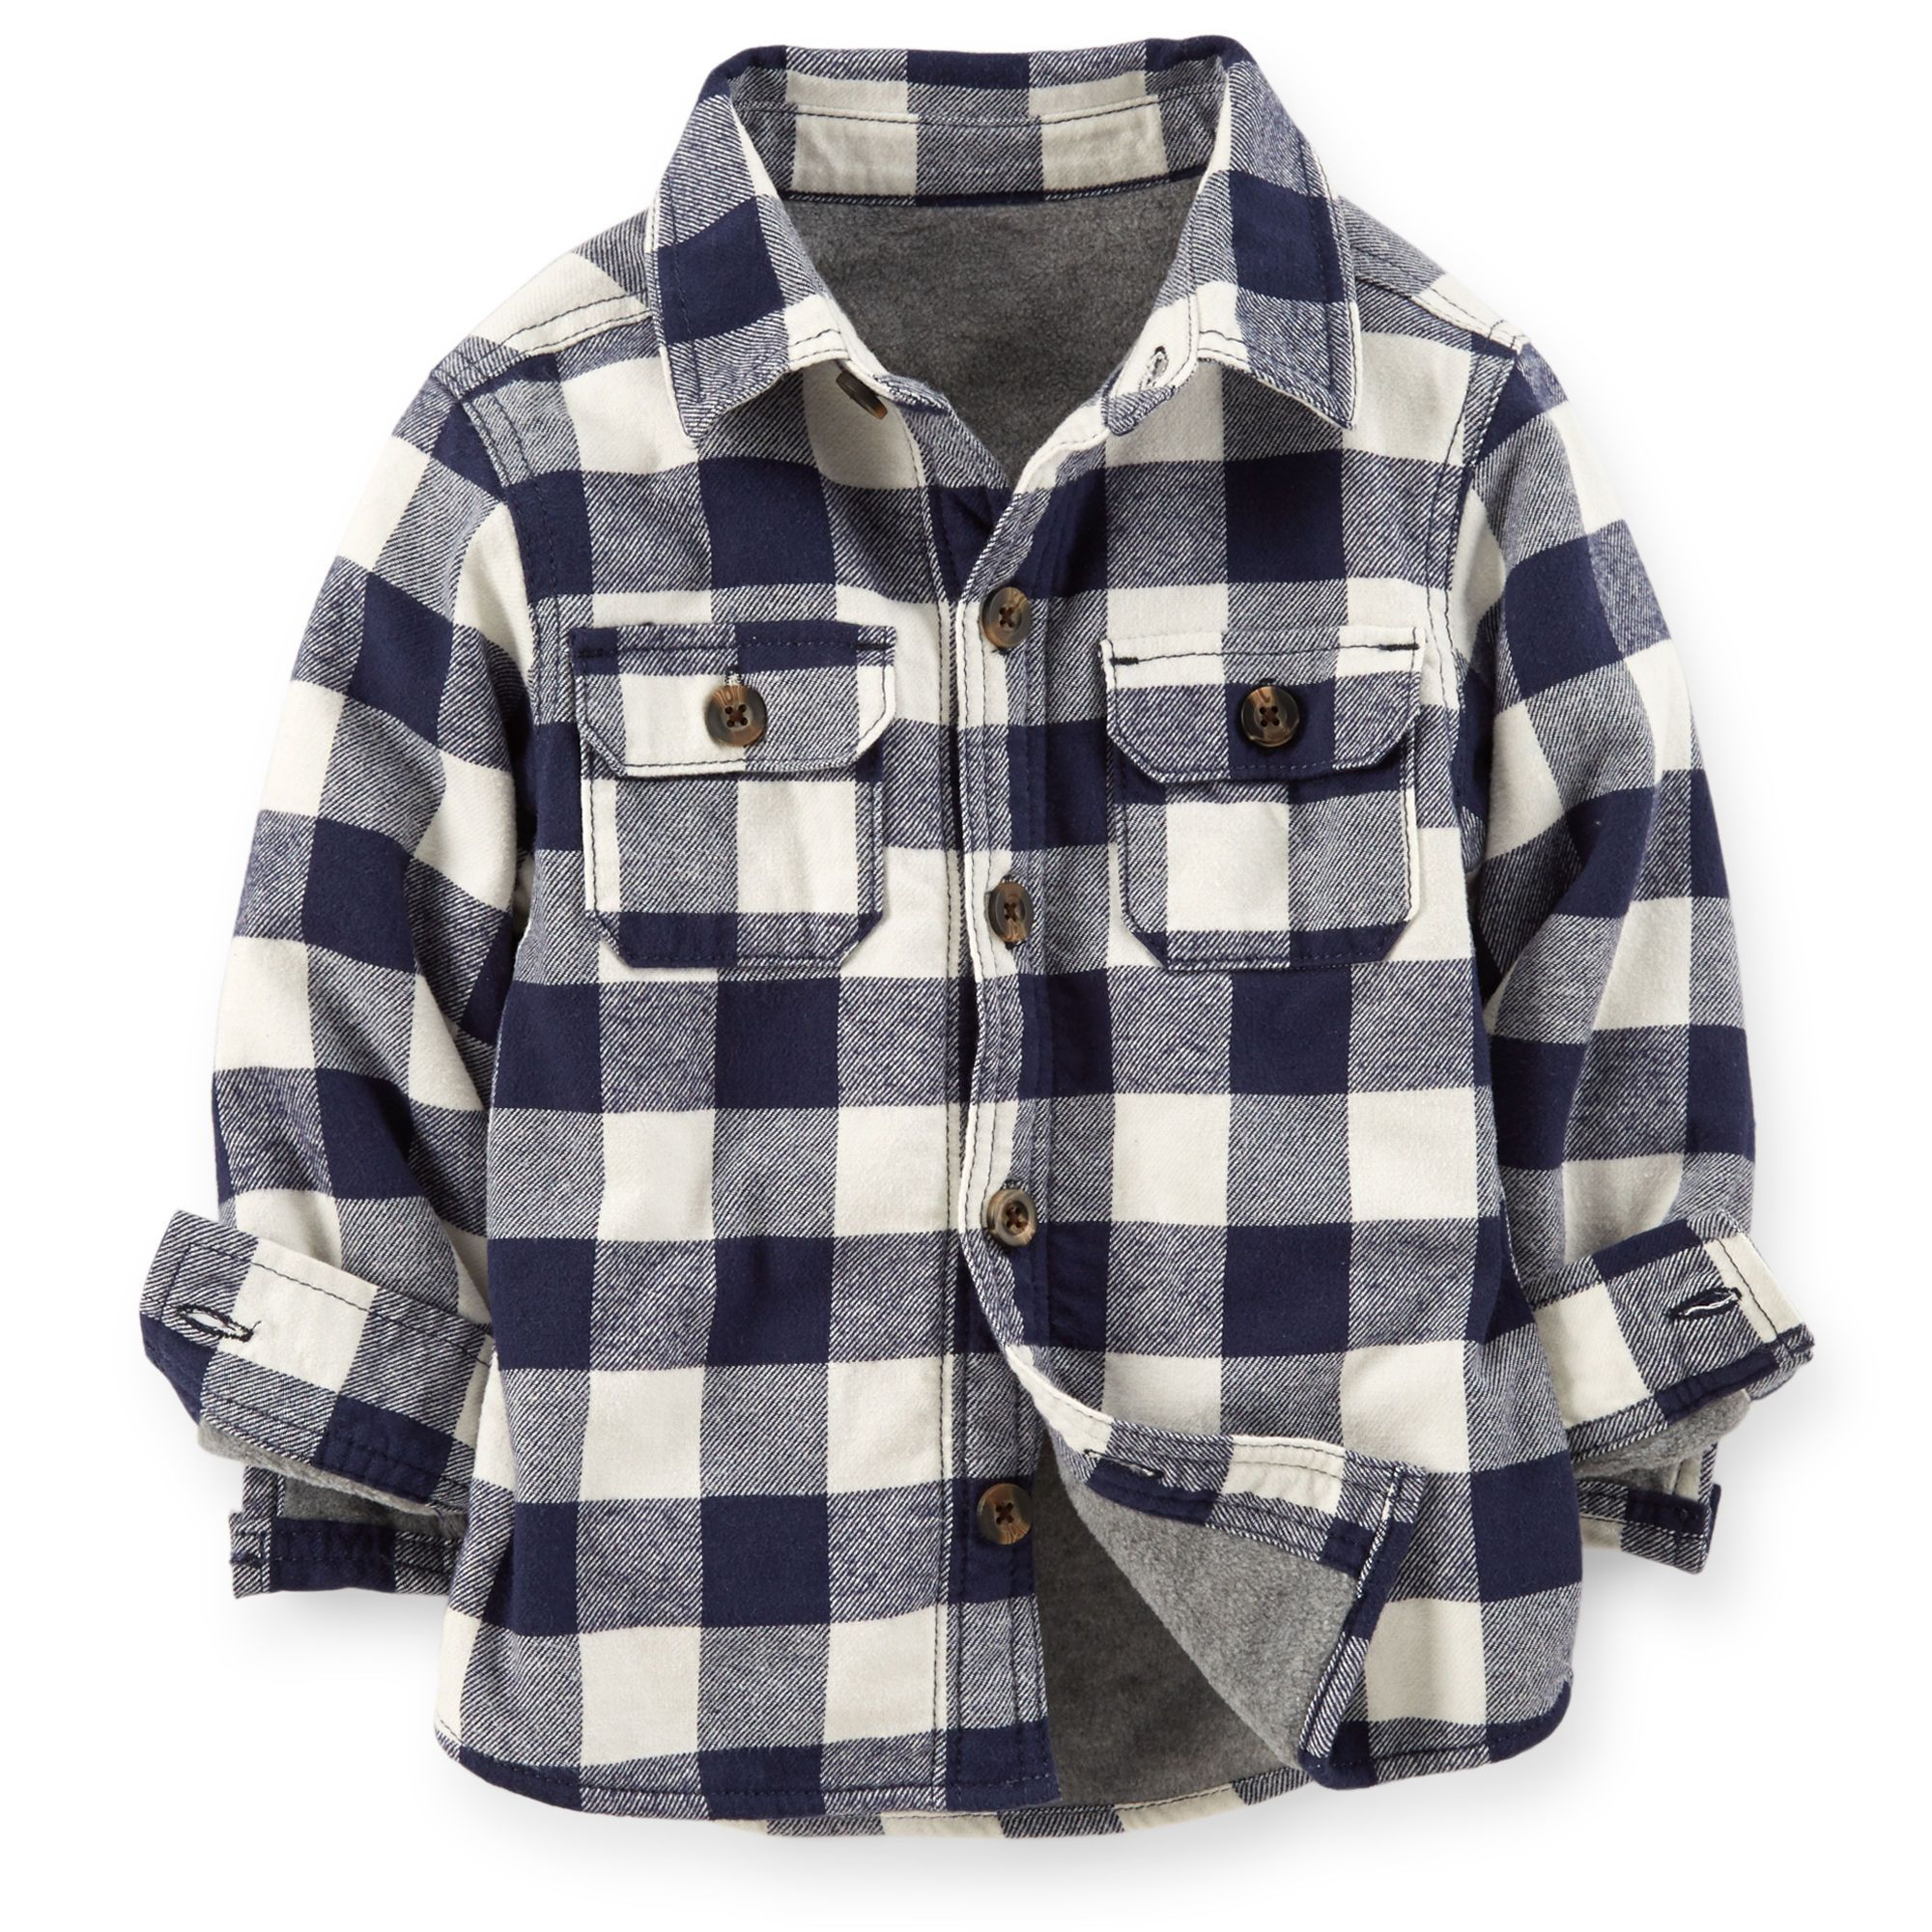 5c5174460 Fleece-Lined Flannel Shirt Jacket